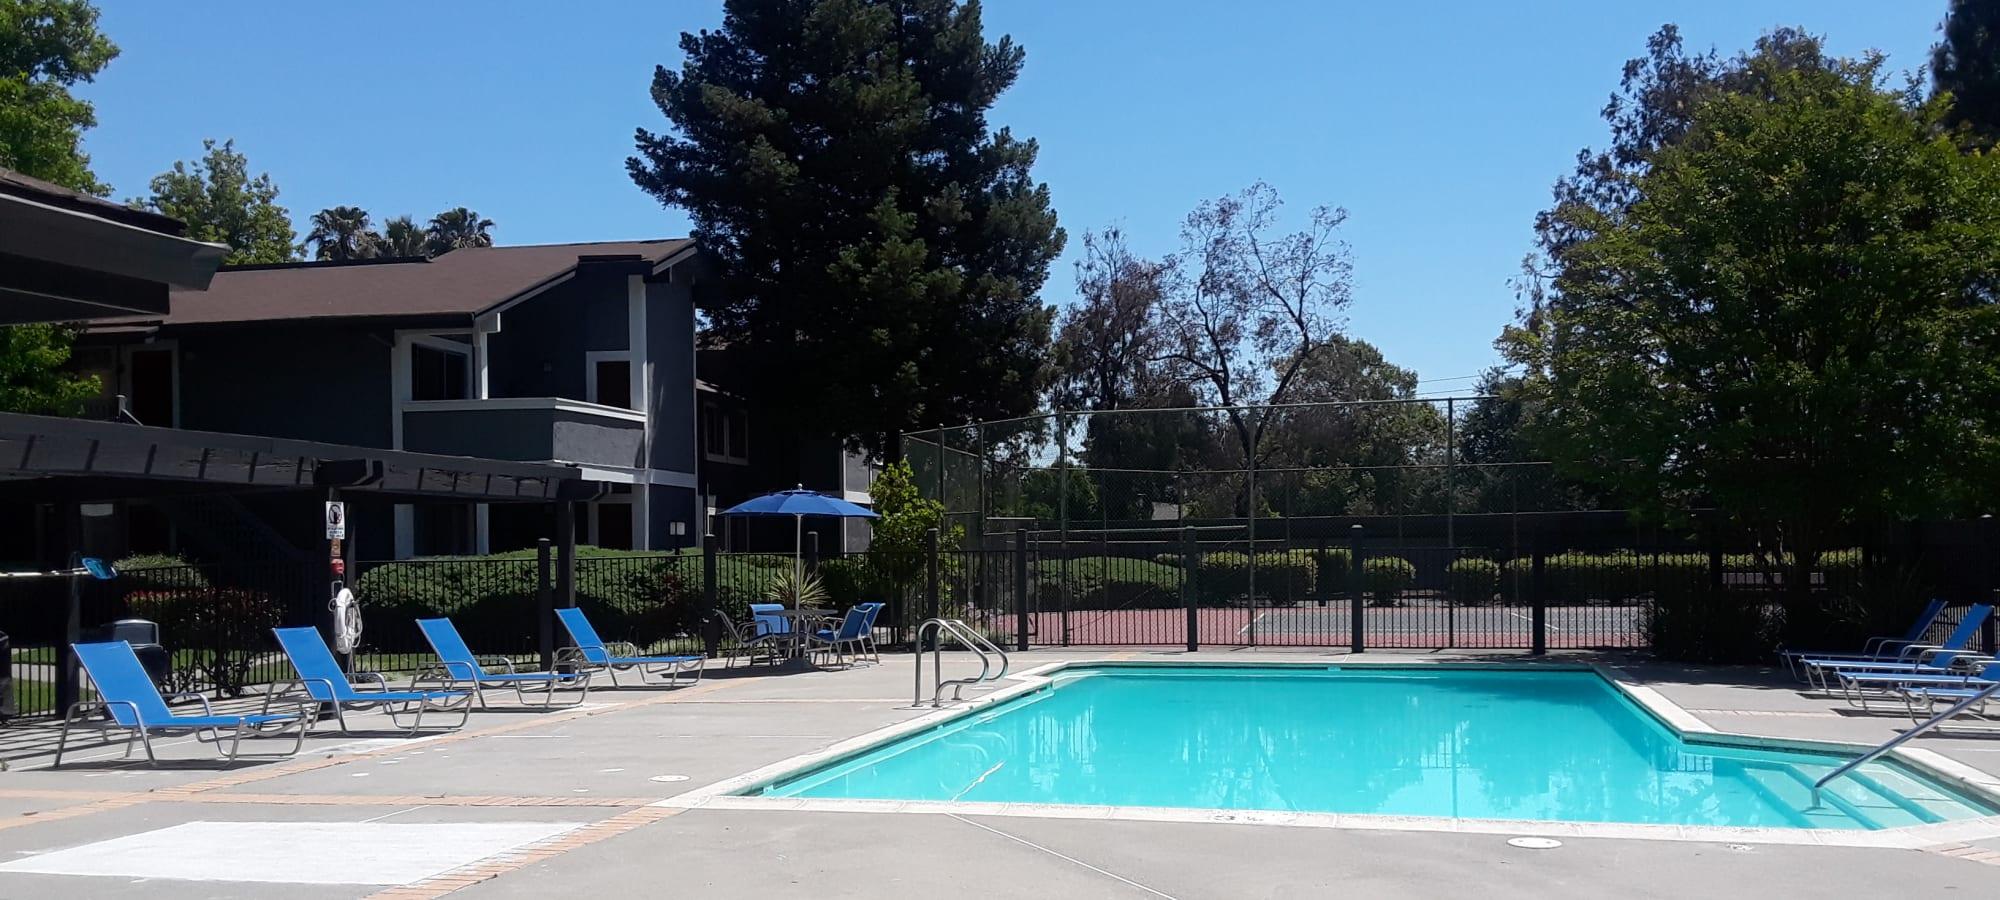 Avery Park Apartments in Fairfield, California